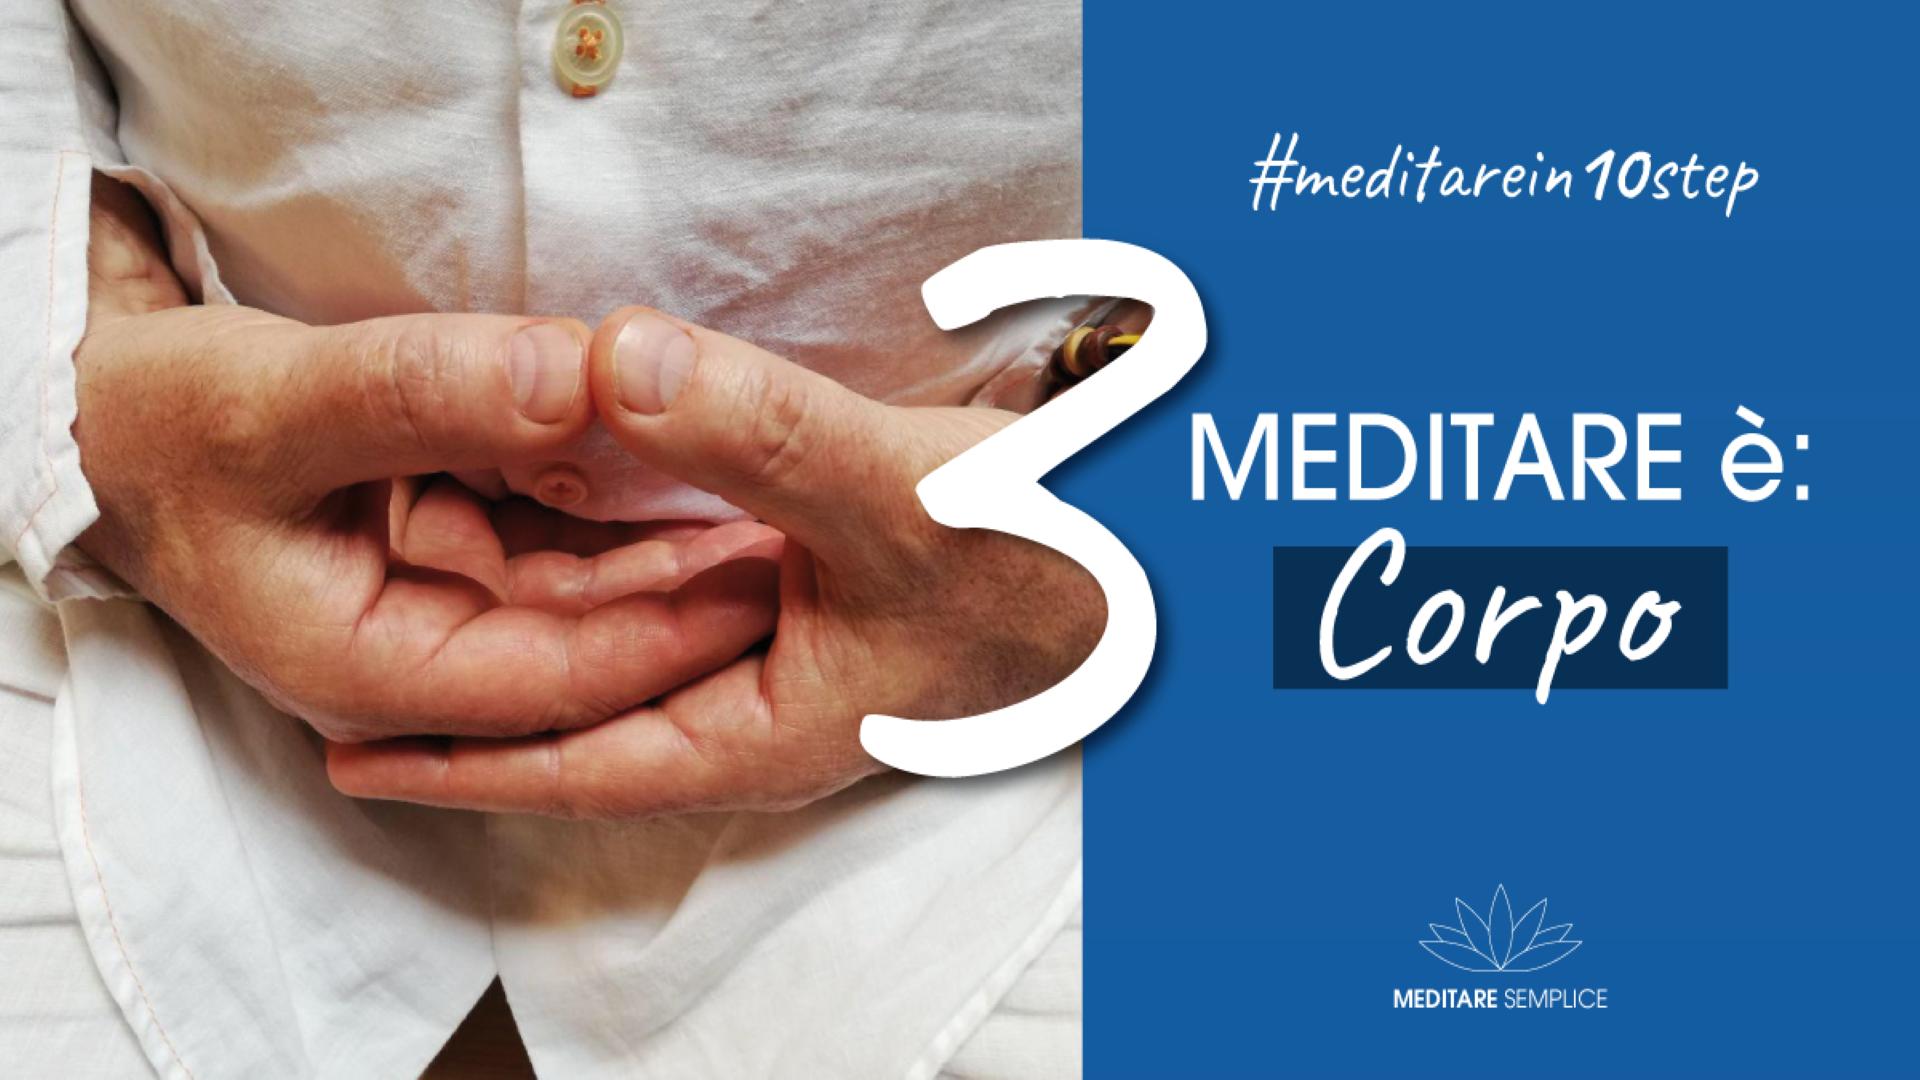 https://meditaedanza.com/wp-content/uploads/2020/09/3-meditare-ä-corpo.png